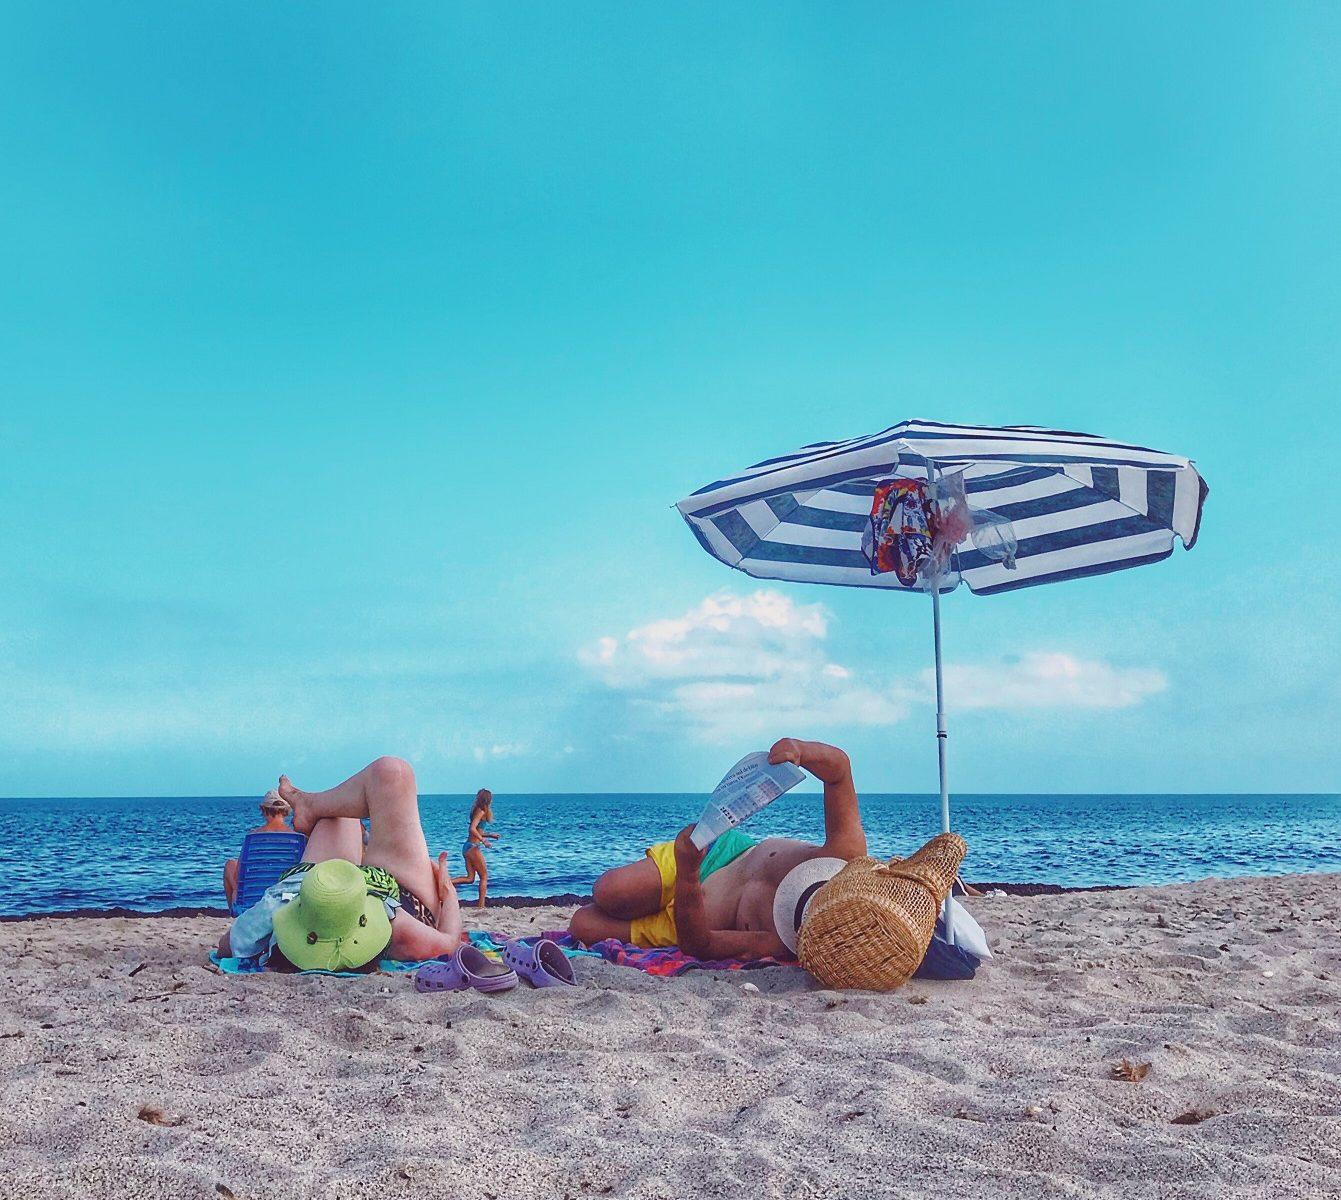 tourists on the beach under an umbrella